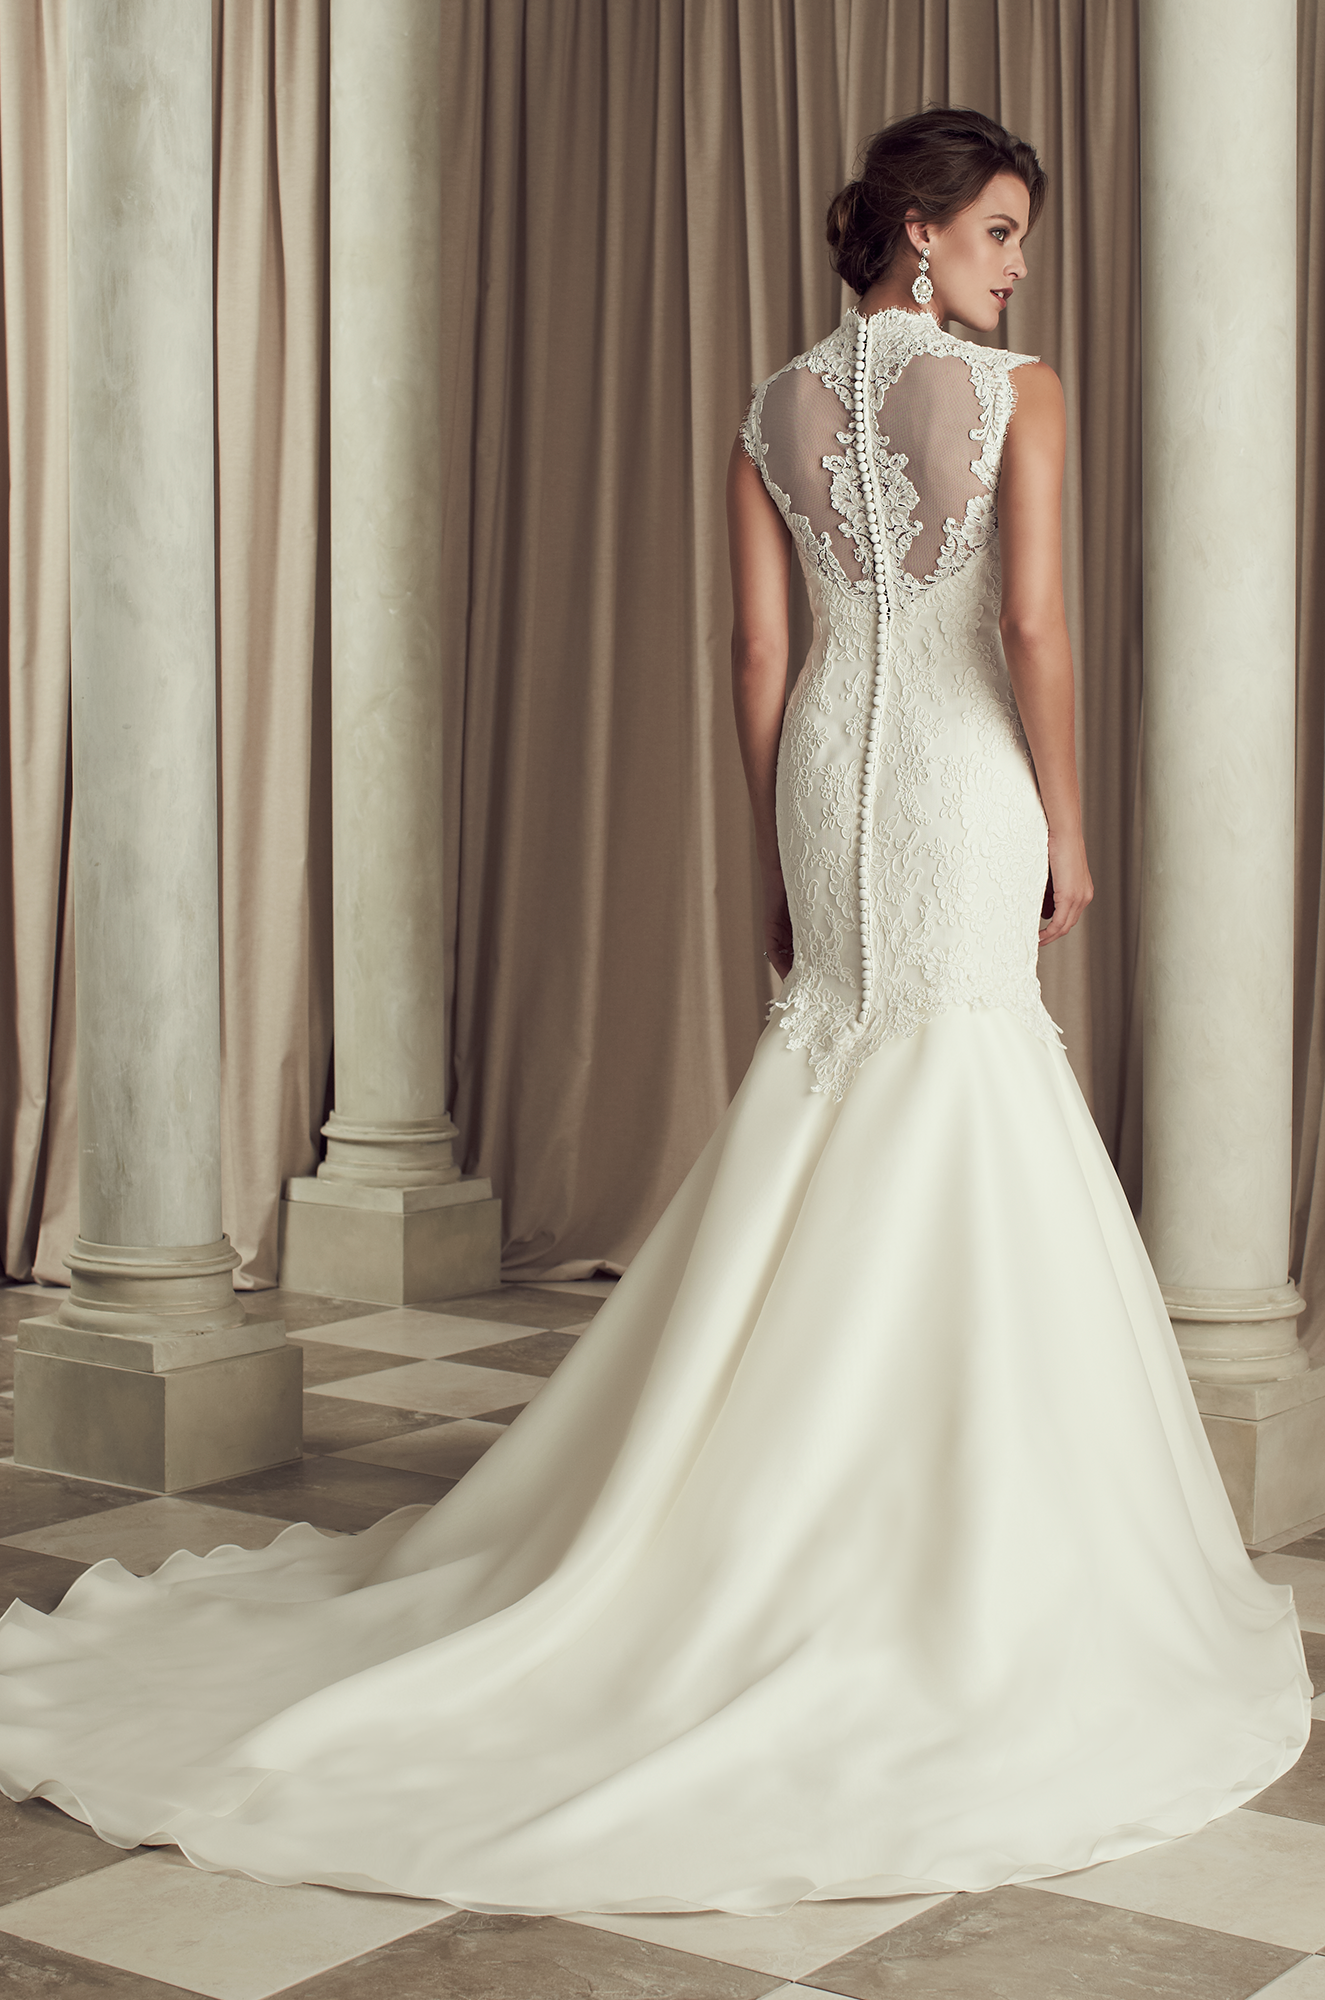 Divine Paloma Blanca Wedding Dresses 2017 Collection